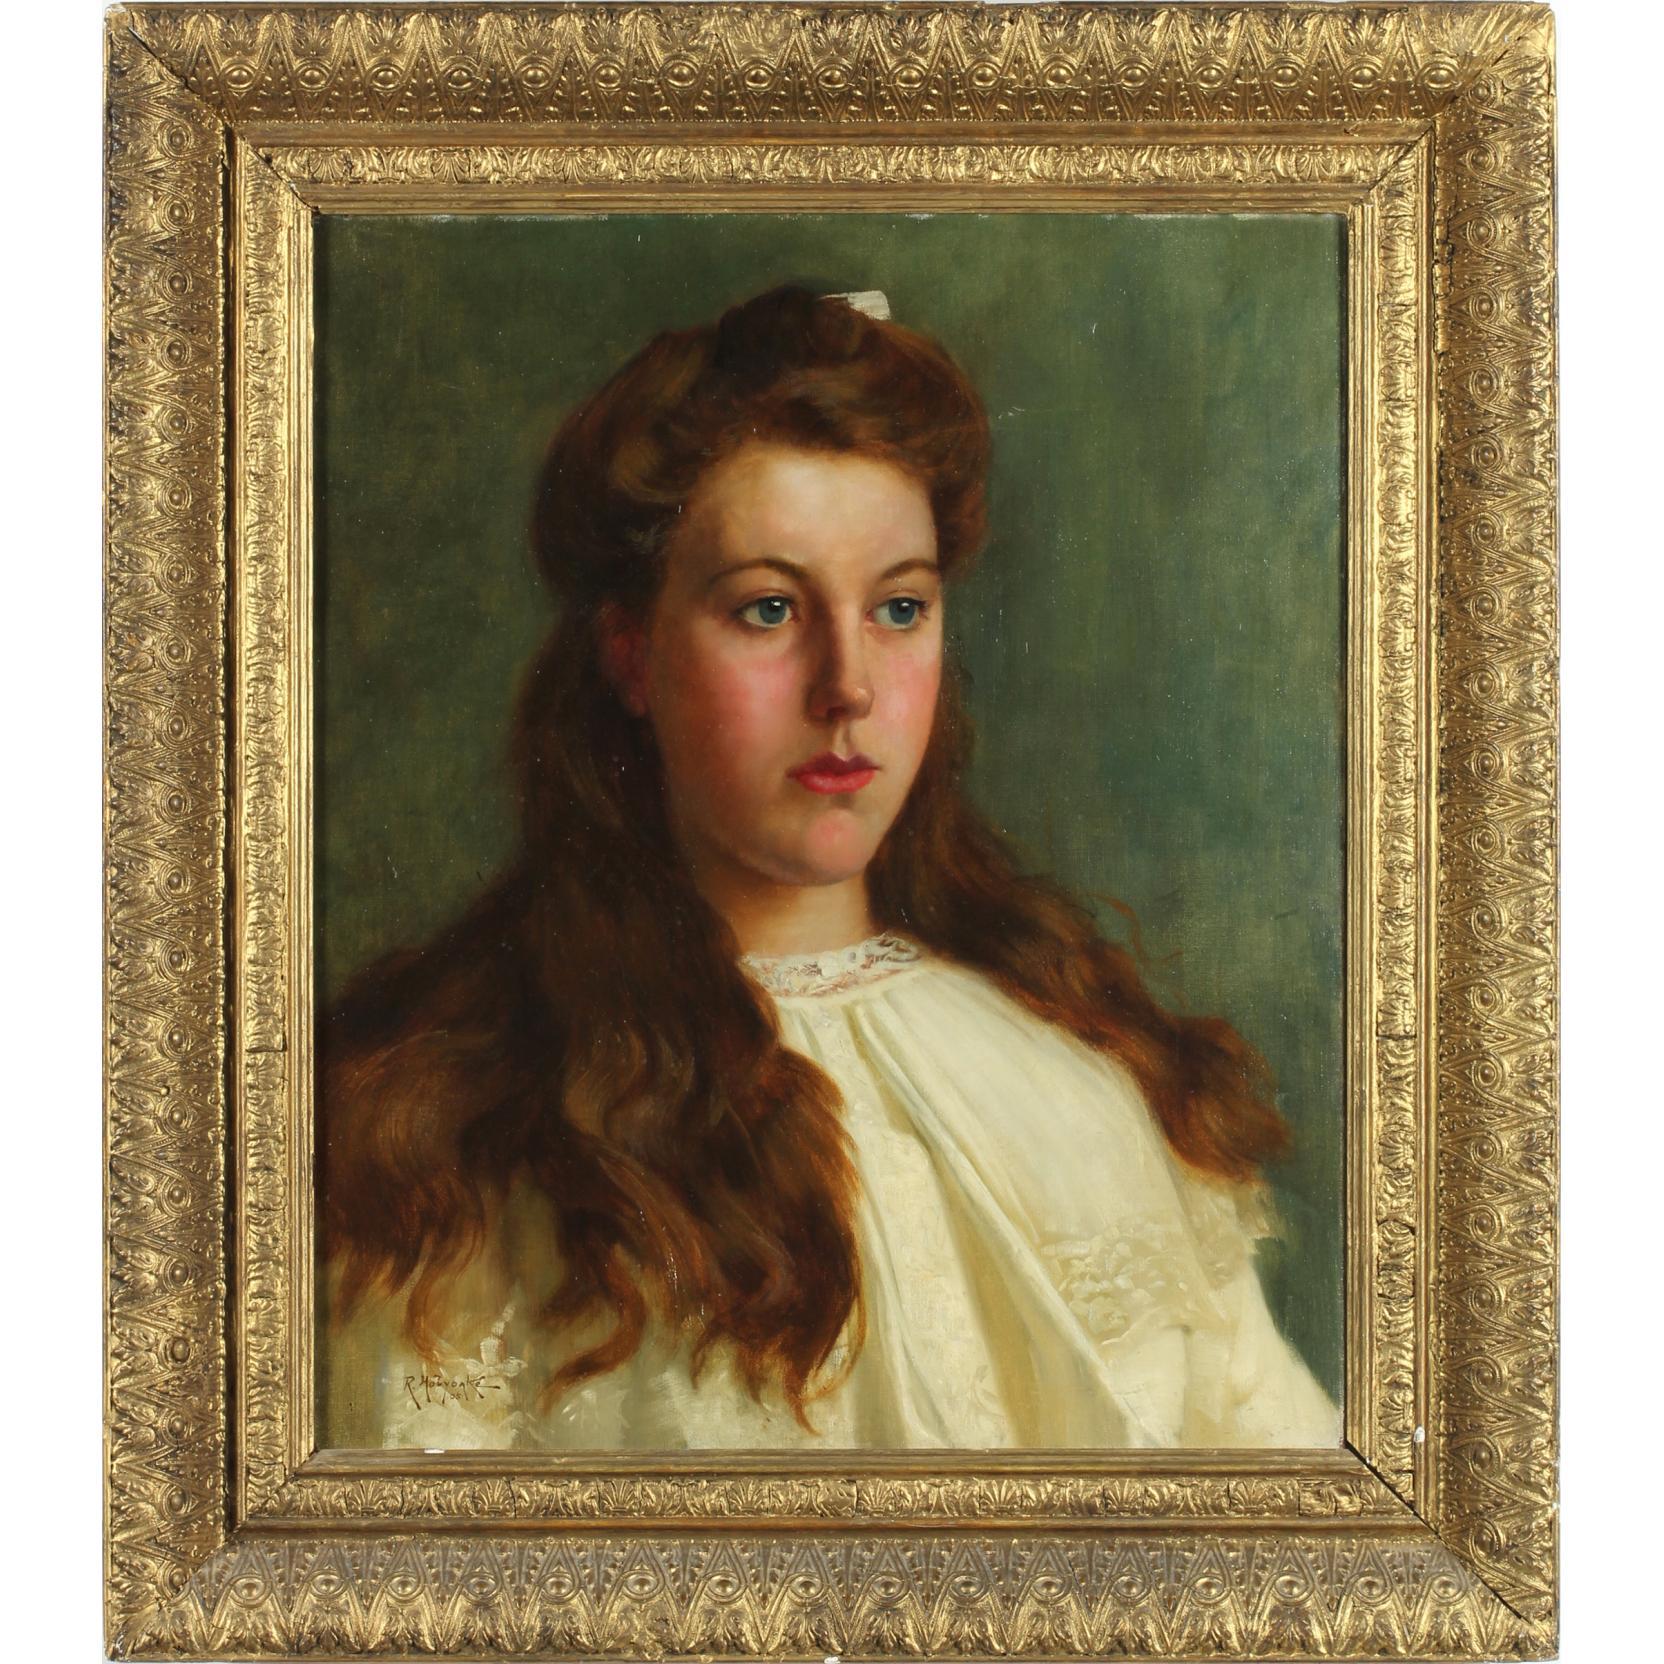 rowland-holyoake-br-1880-1907-portrait